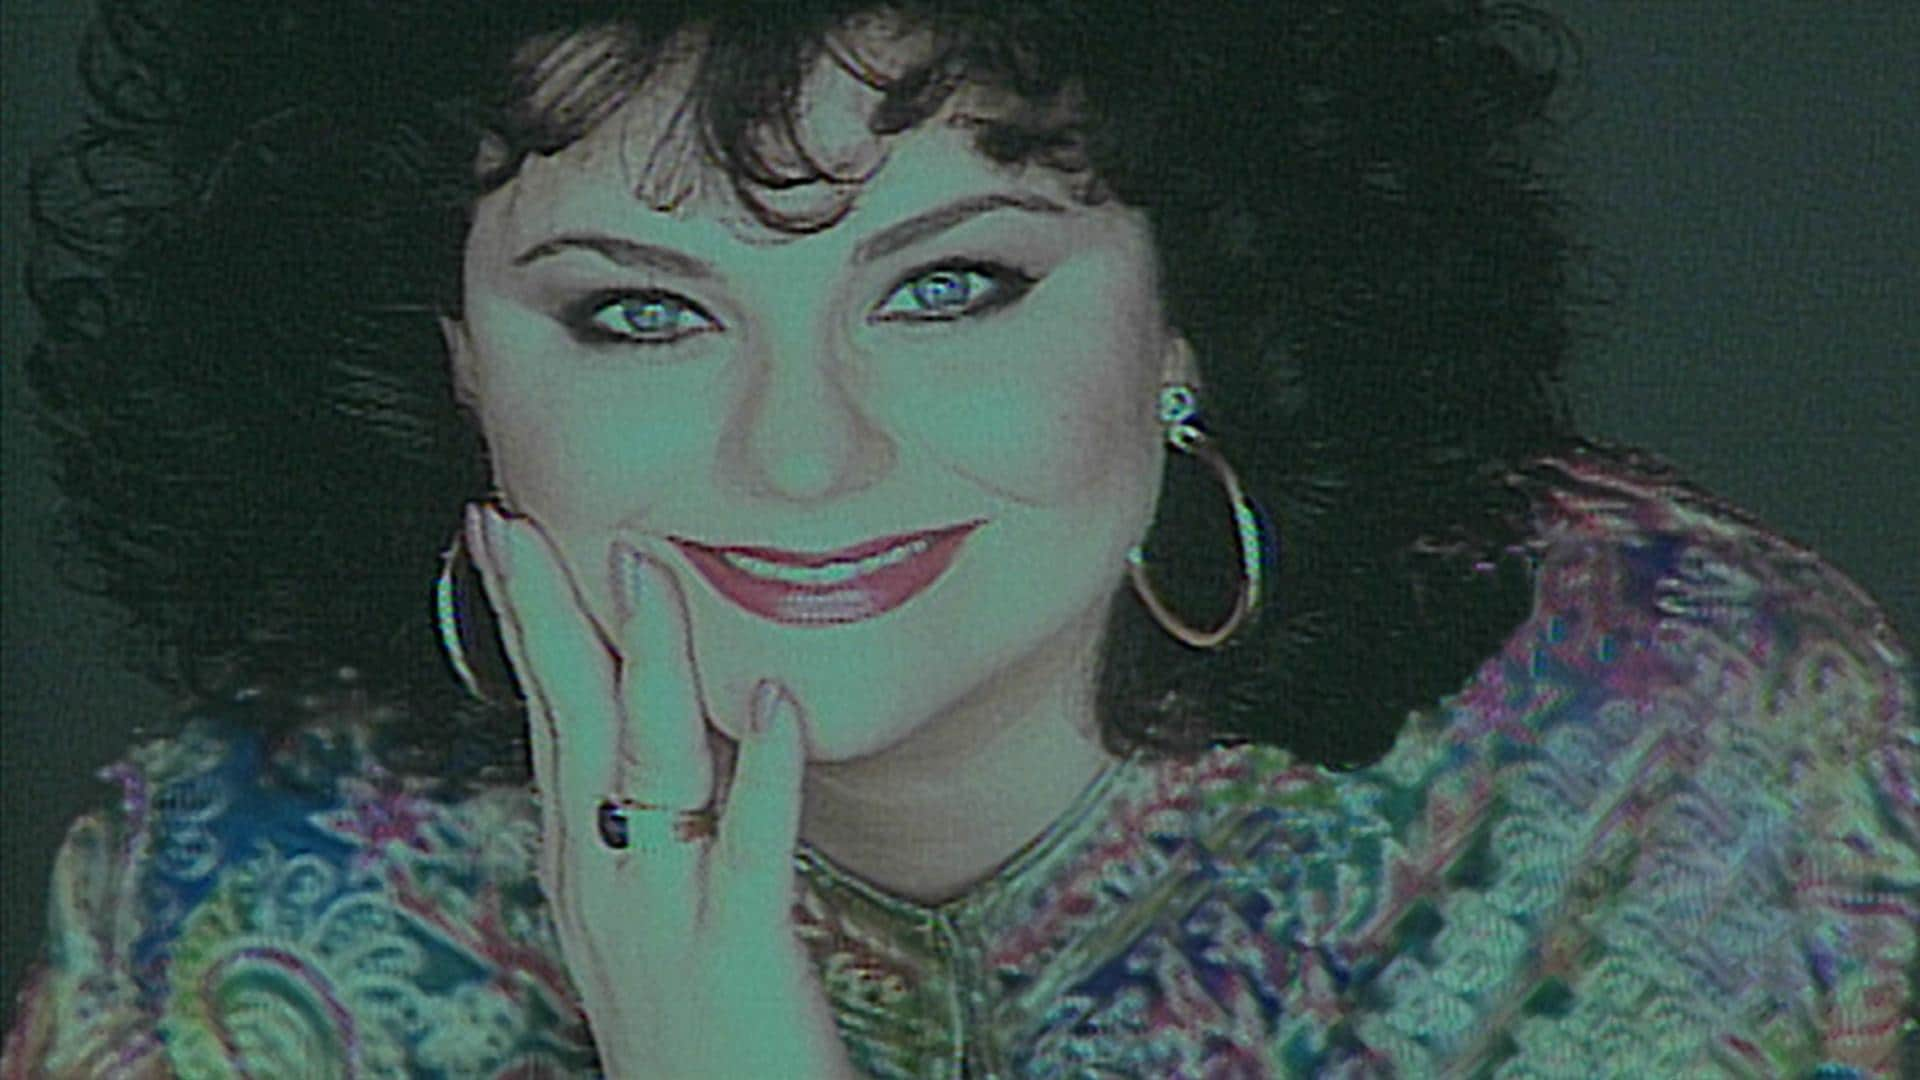 Delta Burke: May 11, 1991